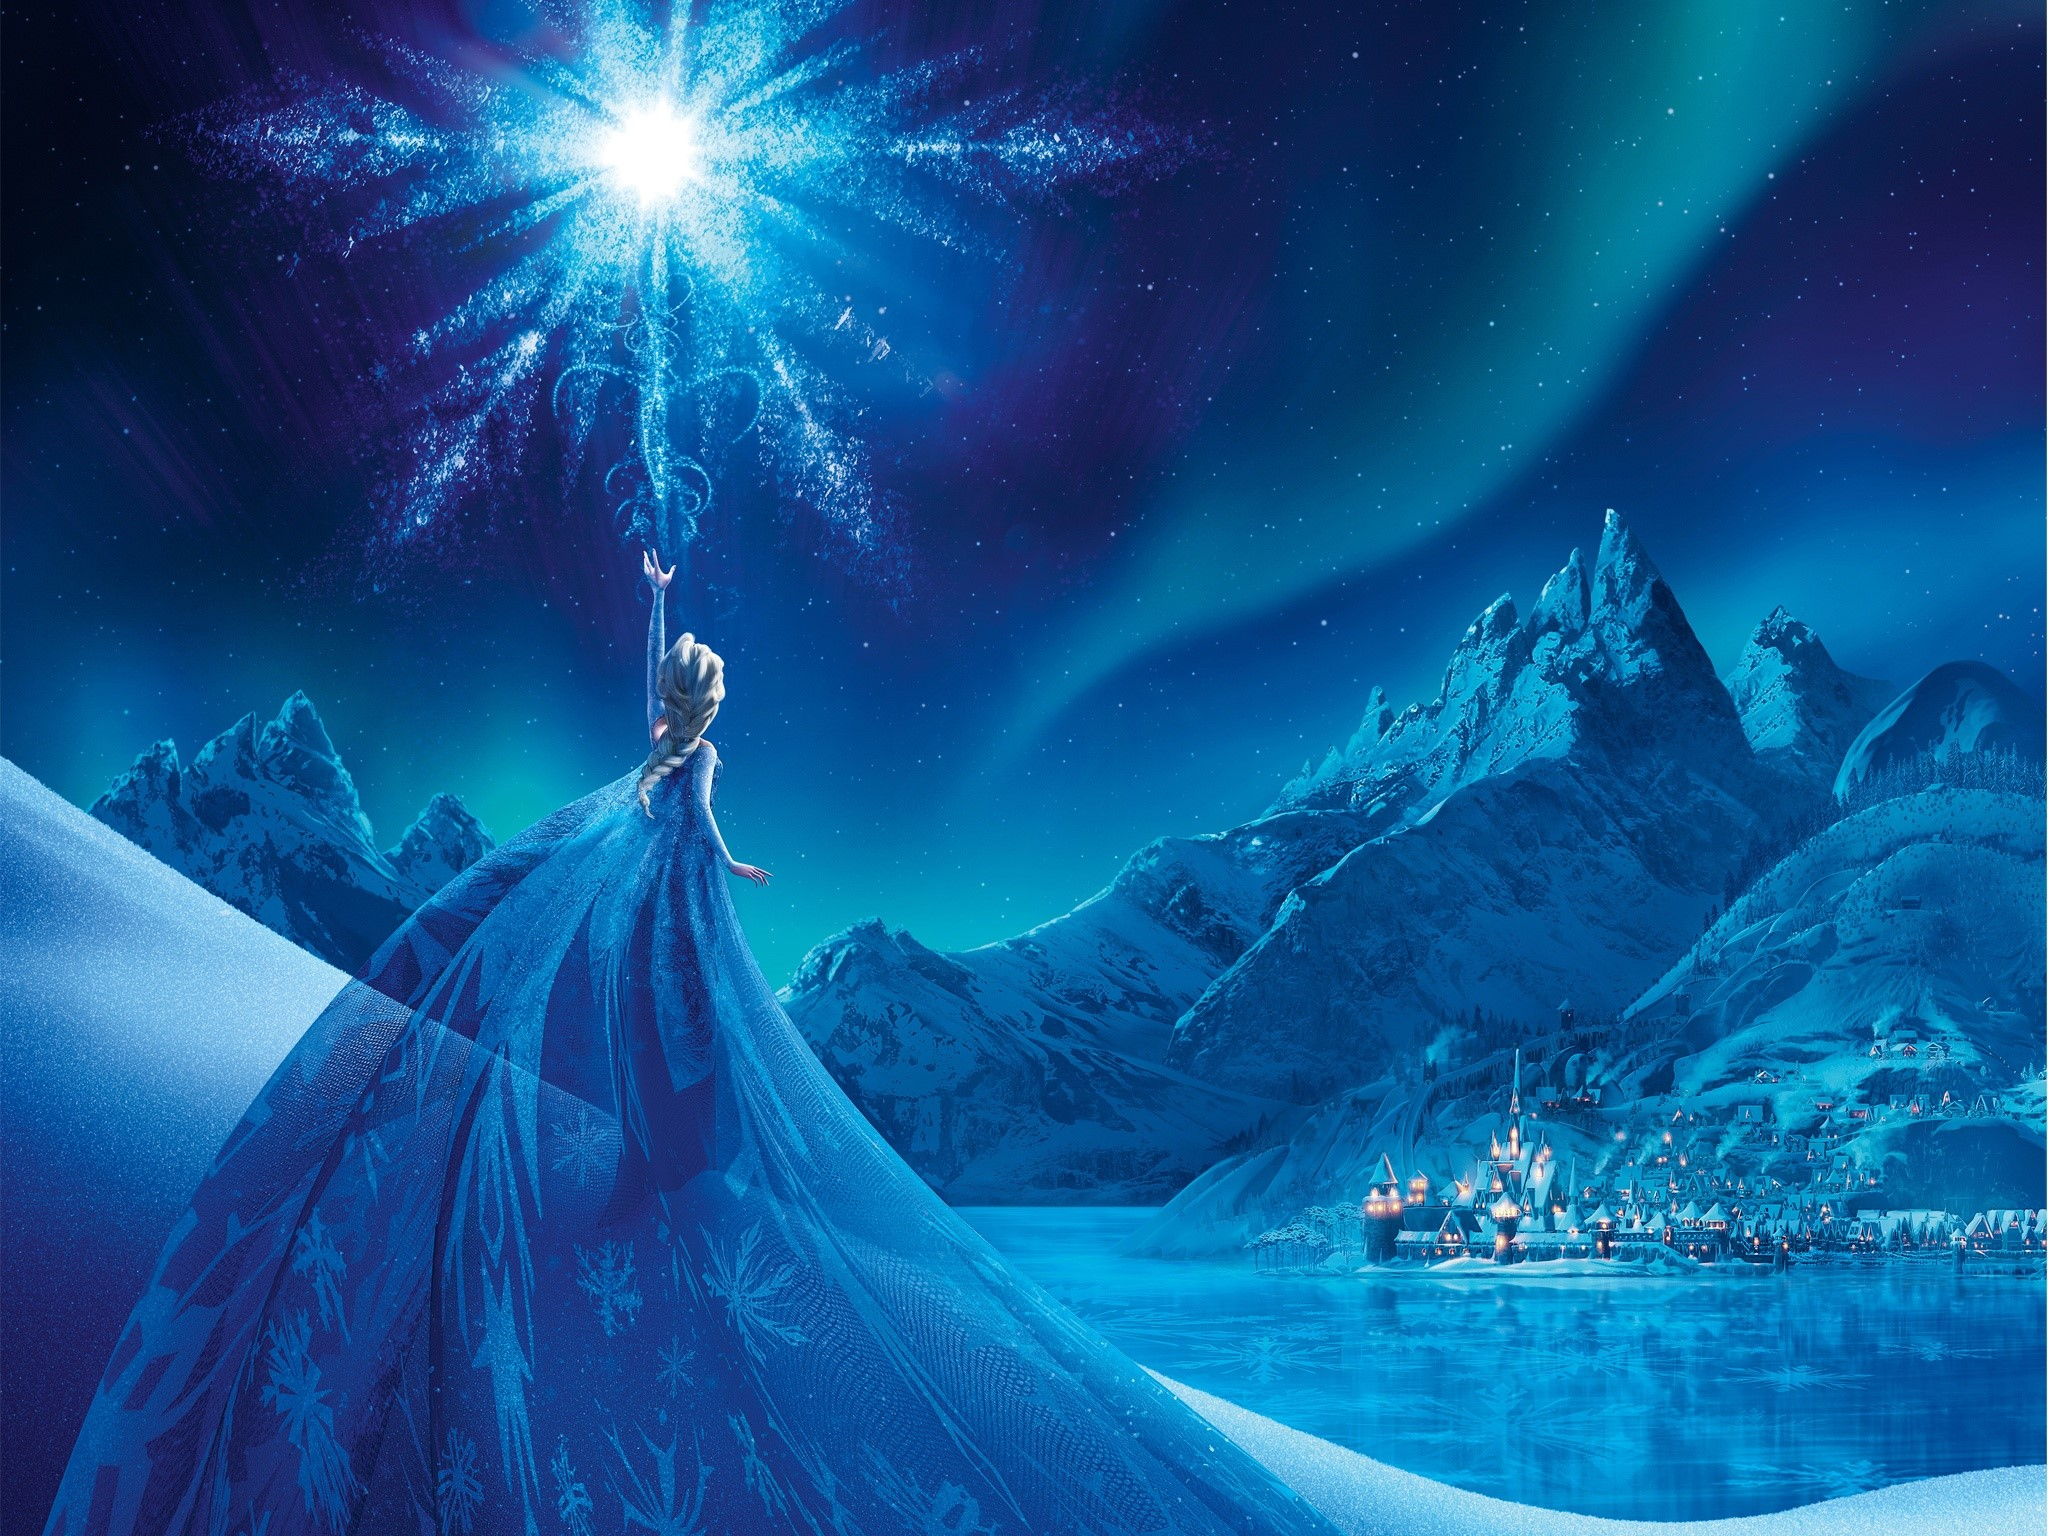 Fondos de pantalla Elsa Reina de hielo